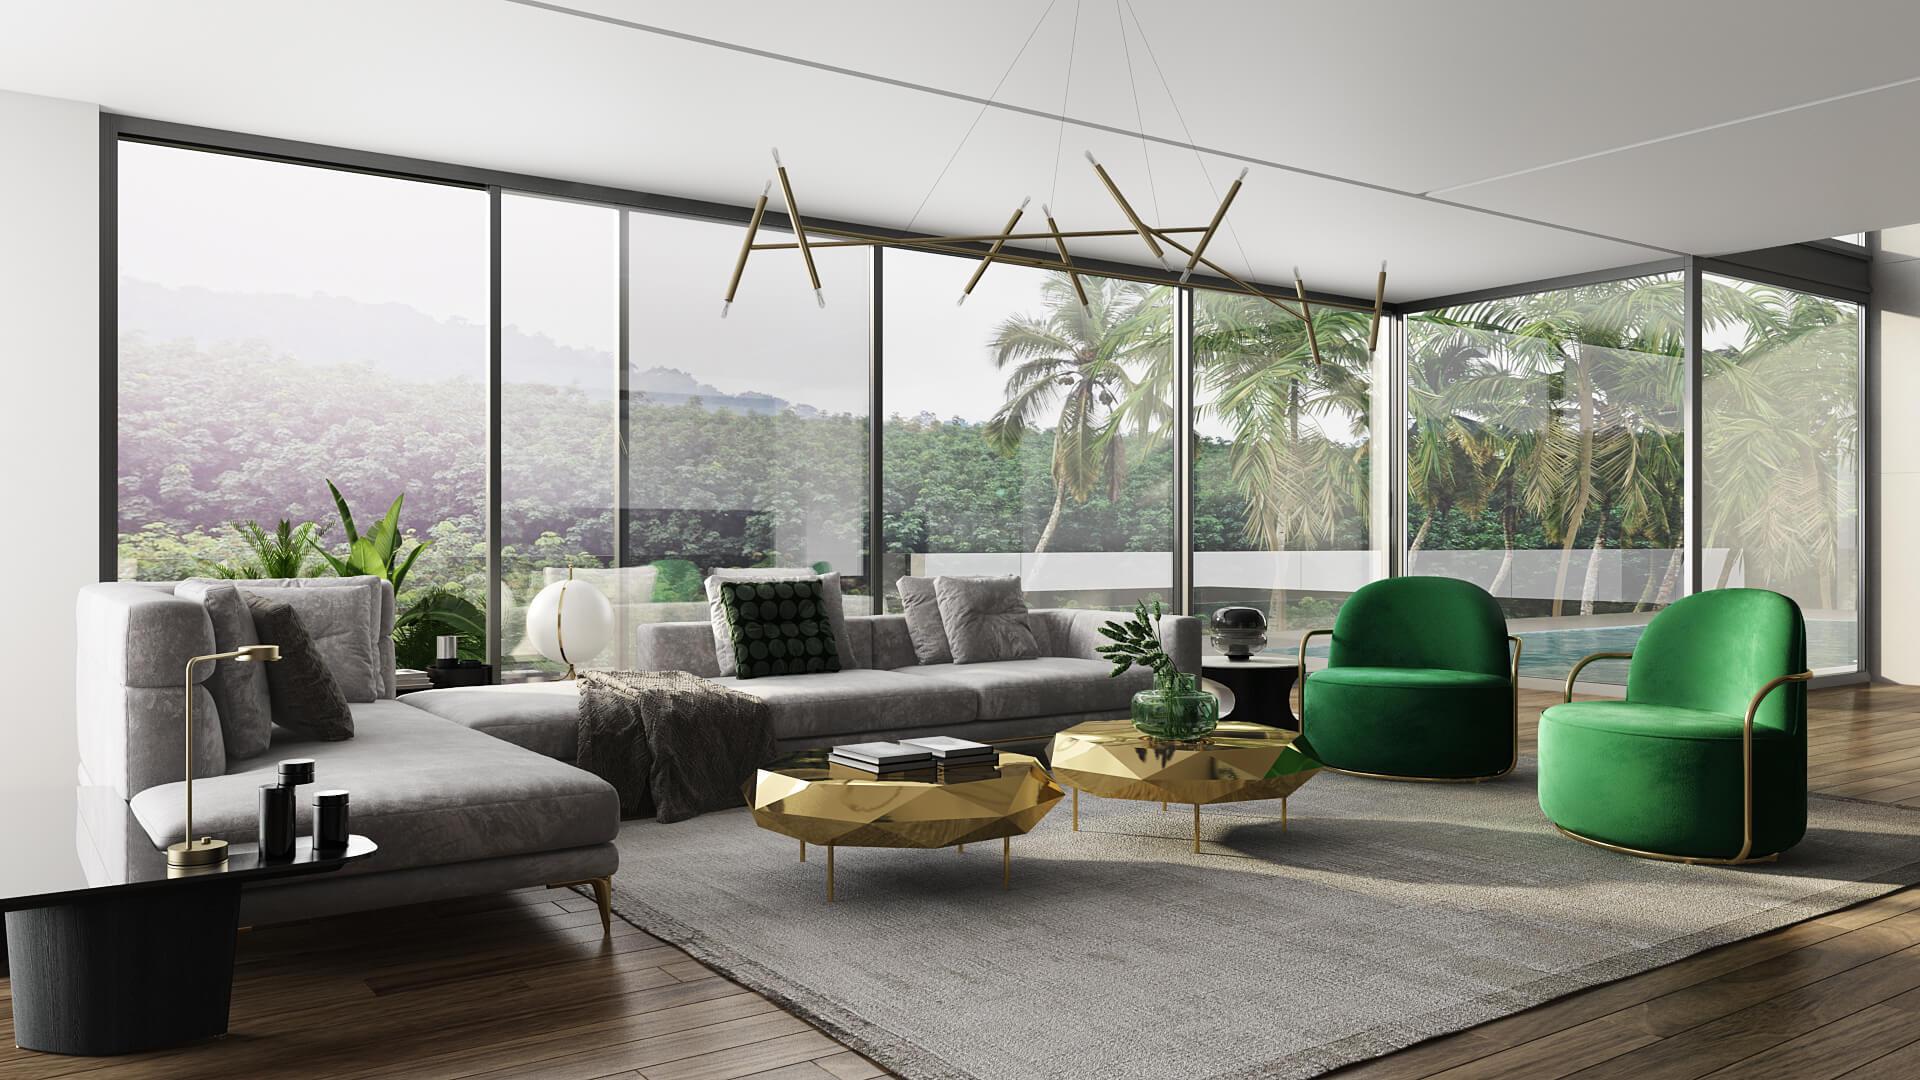 CGI for an Elegant Modern Room